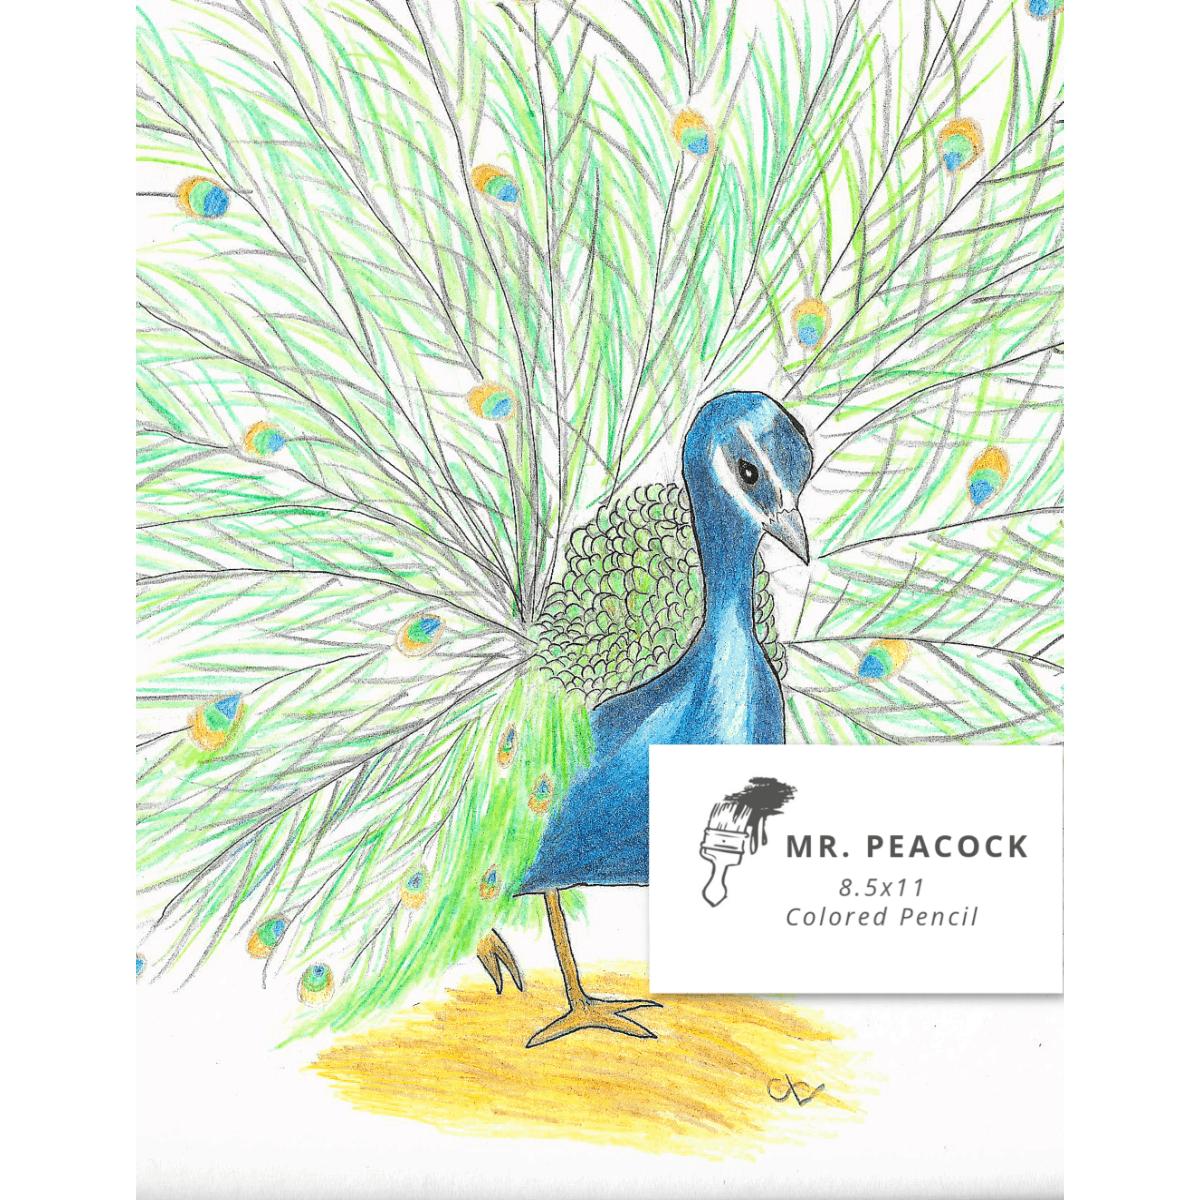 8.5x11 Mr. Peacock